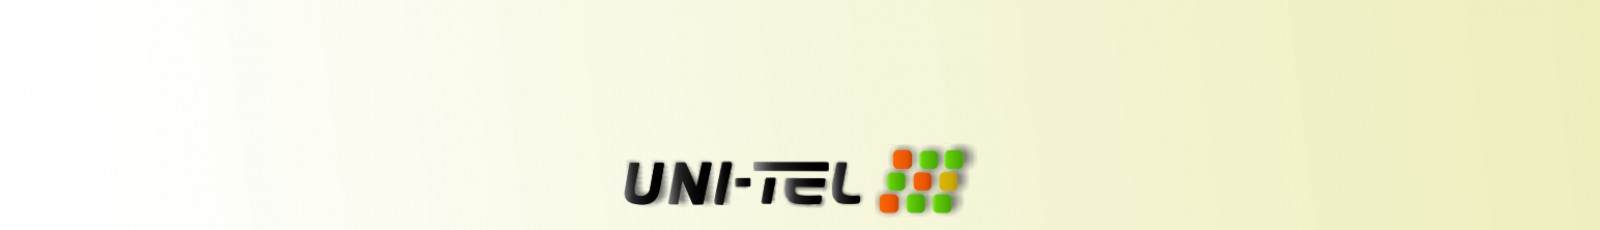 cropped-UNI-TEL-Website-Banner1.jpg